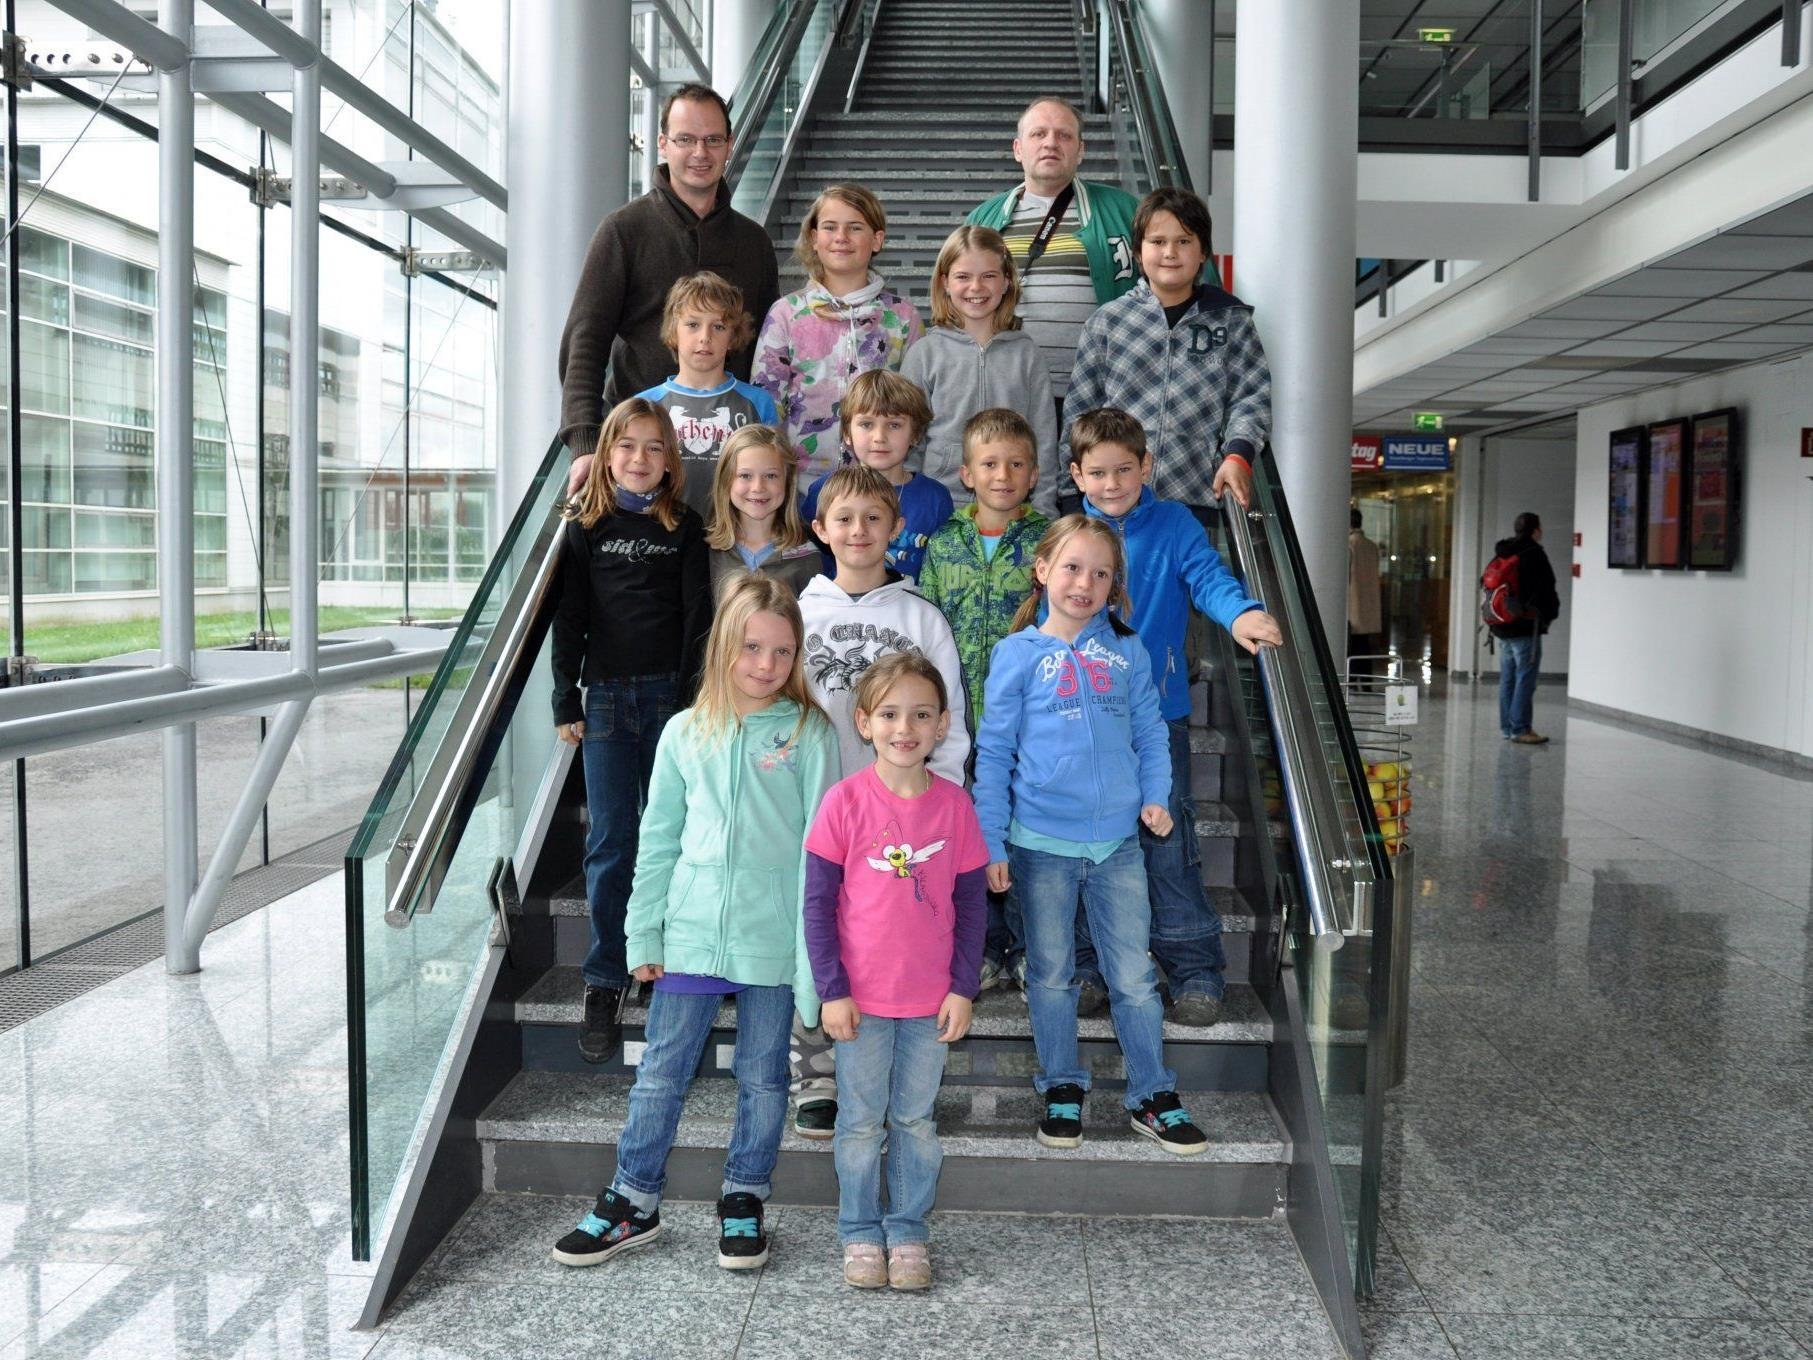 Die Schüler der VS Viktorsberg im Vorarlberger Medienhaus.